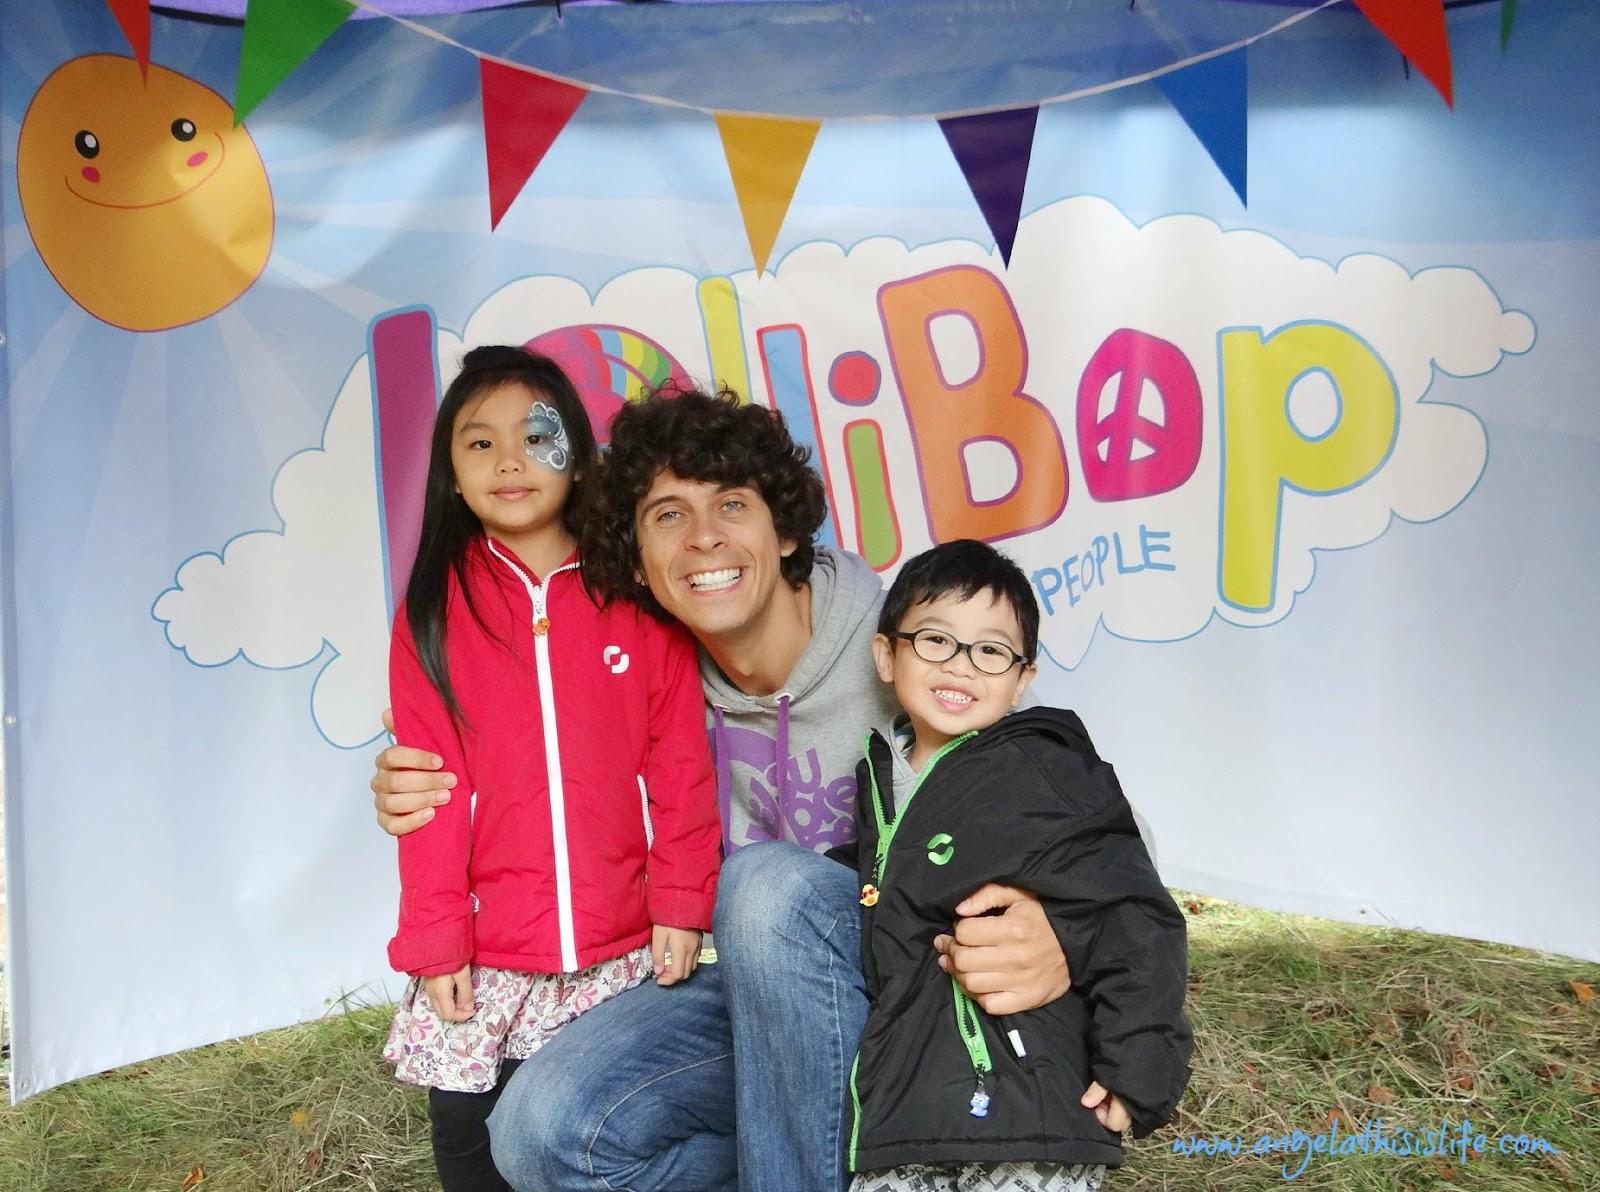 LolliBop Festival 2014, children Summer festival, CBeebies stars